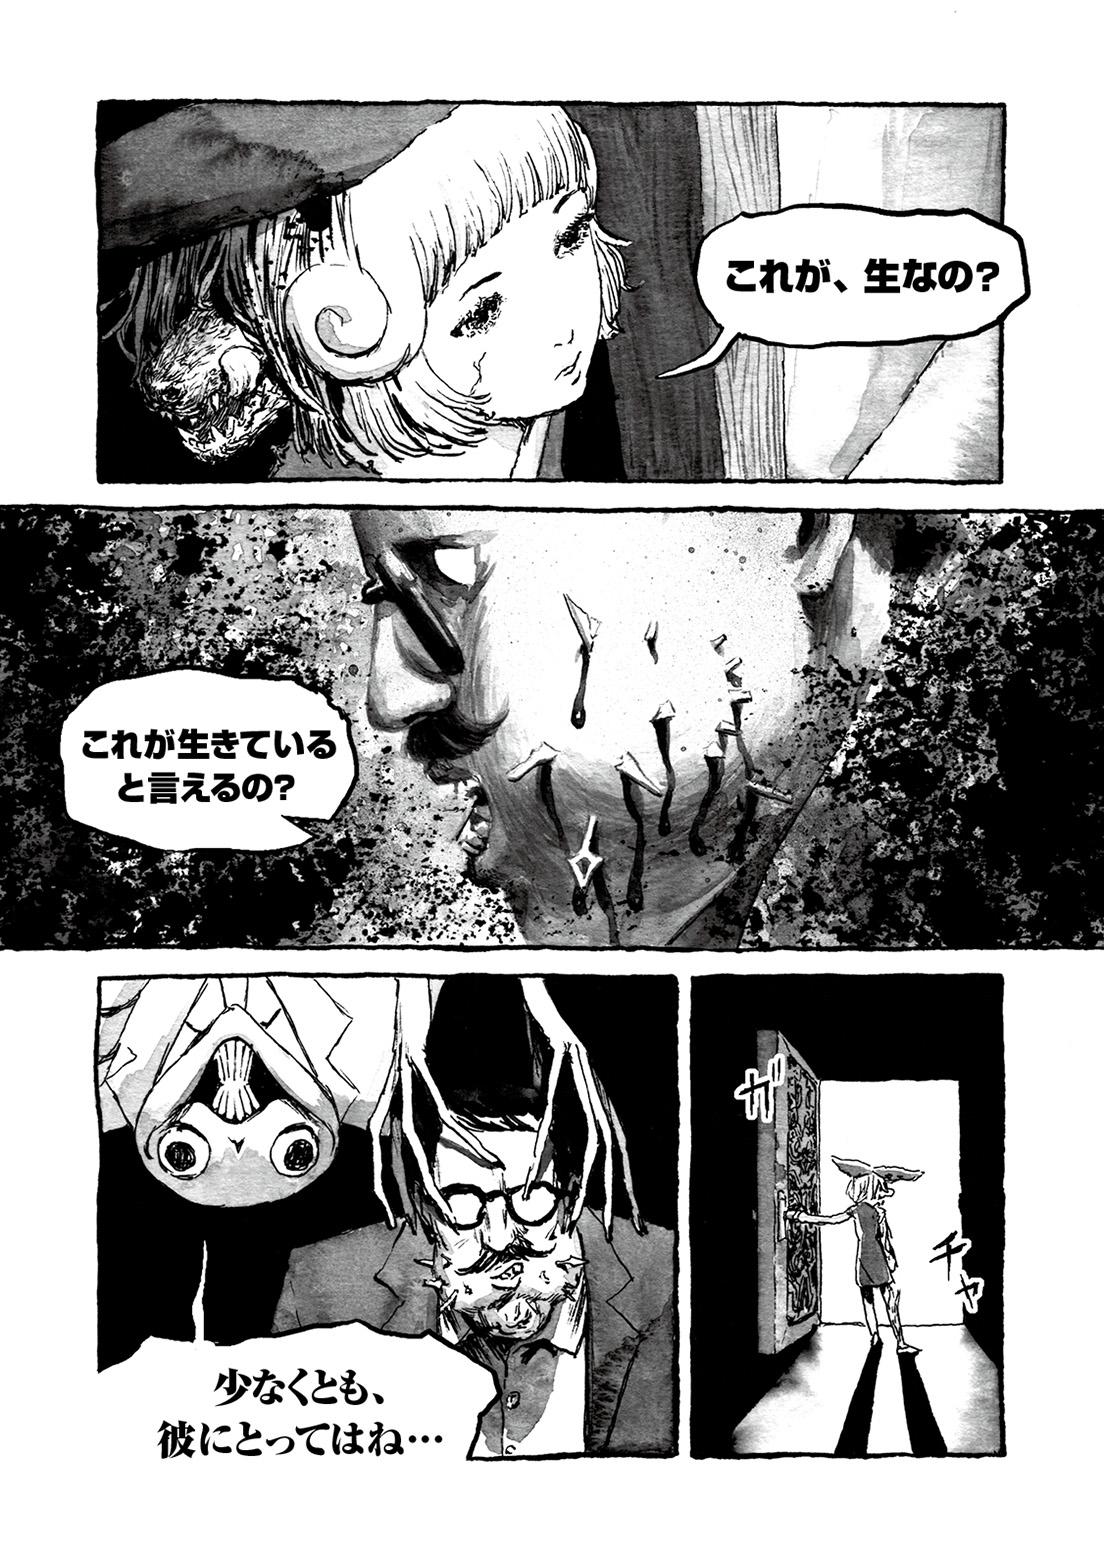 長編漫画「BIBLIOMANIA」連載 第4話「285号室の食卓」26P